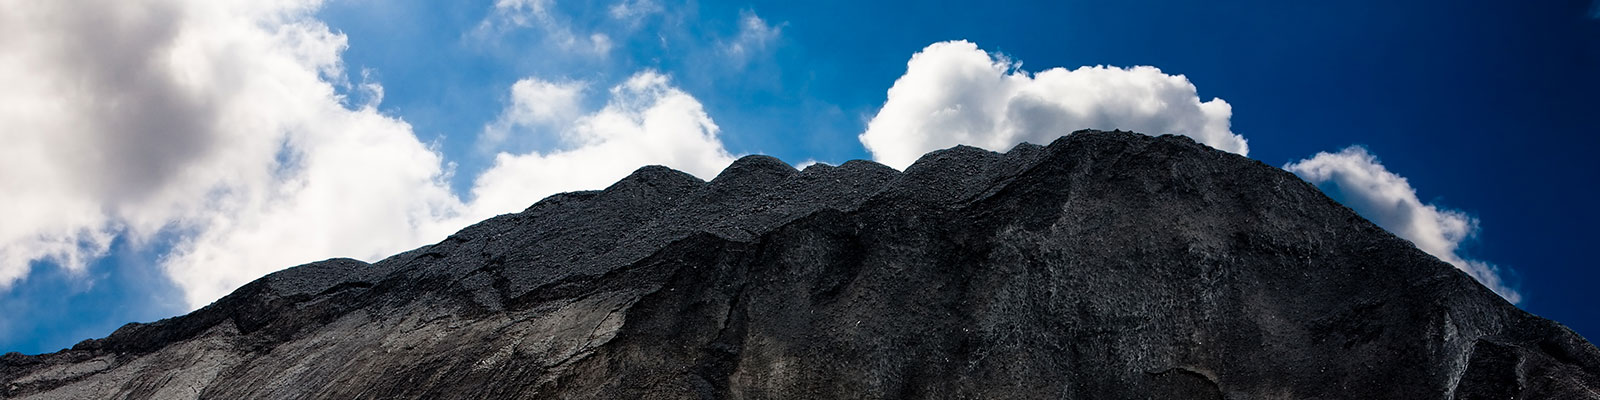 Kohle zum Thema Konventionelle Energieträger; Quelle: mauritius images/Cultura